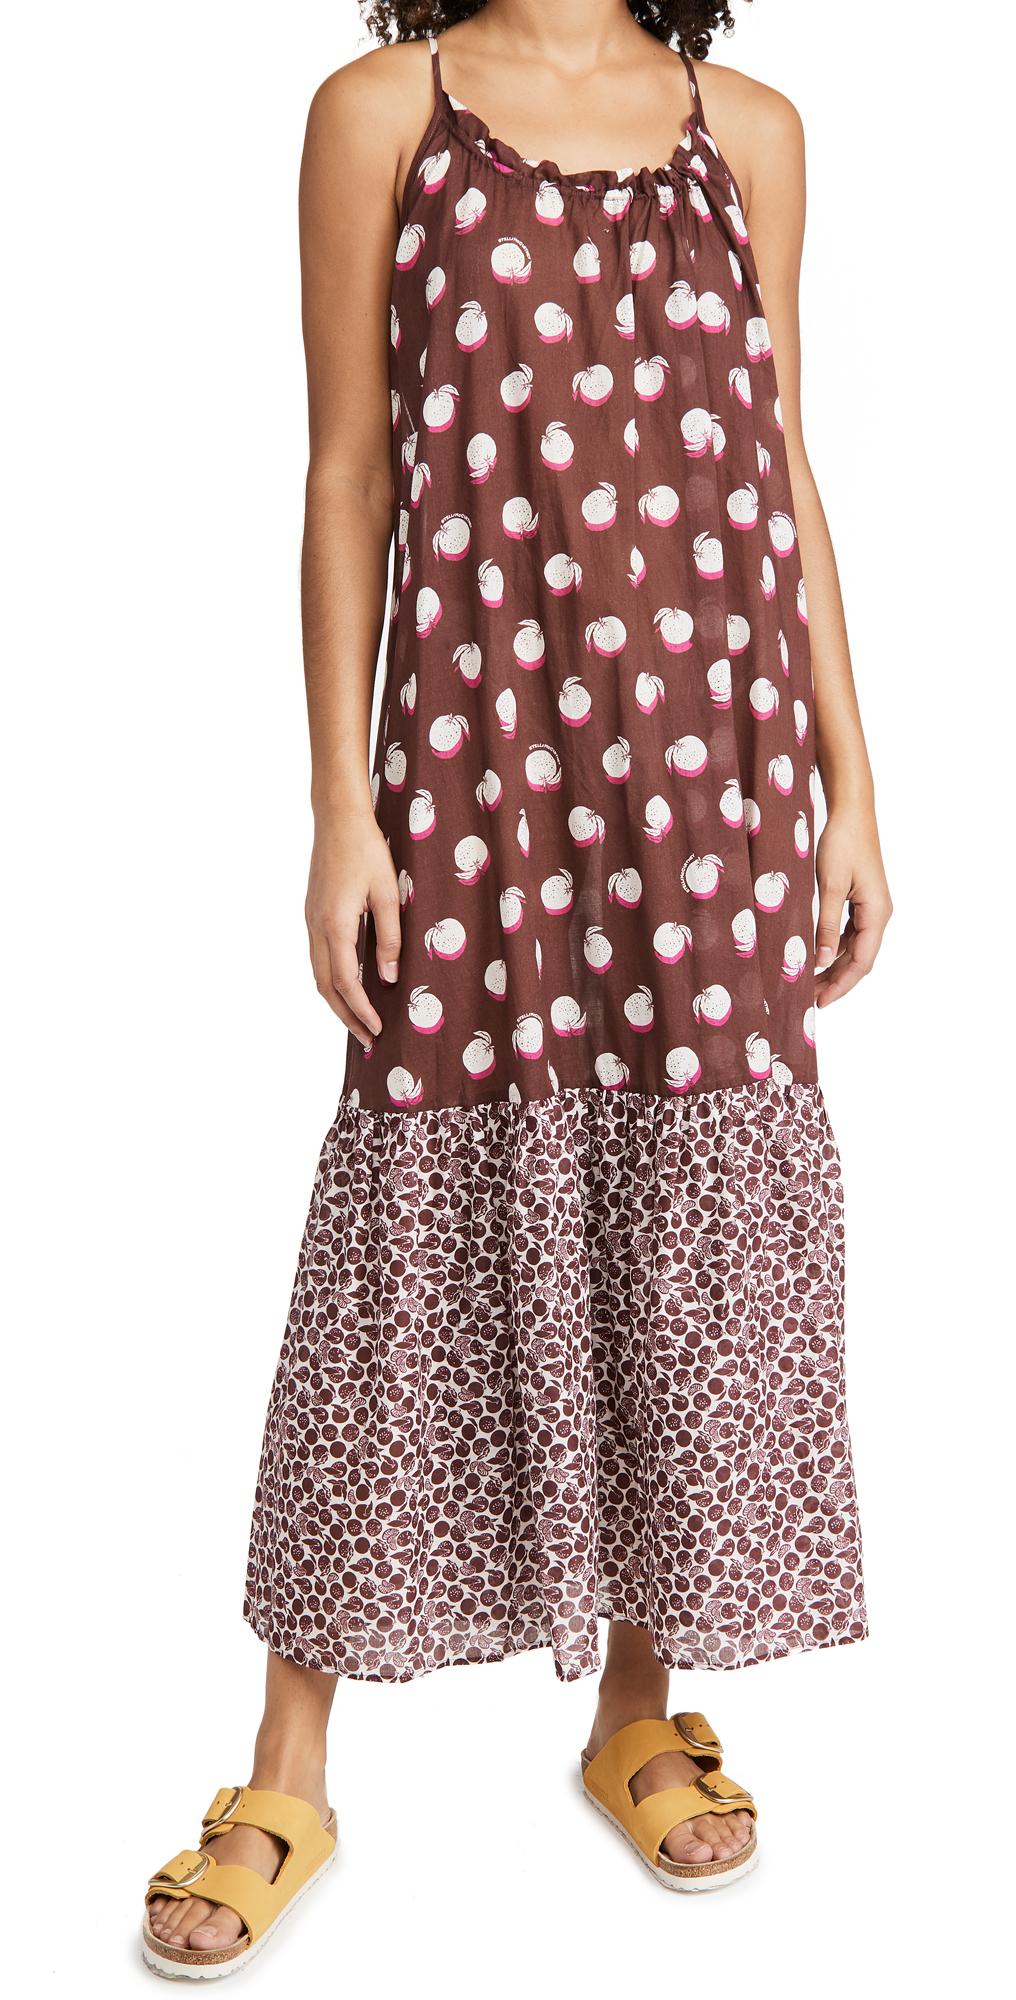 Stella McCartney Ruched Oranges Print Long Dress